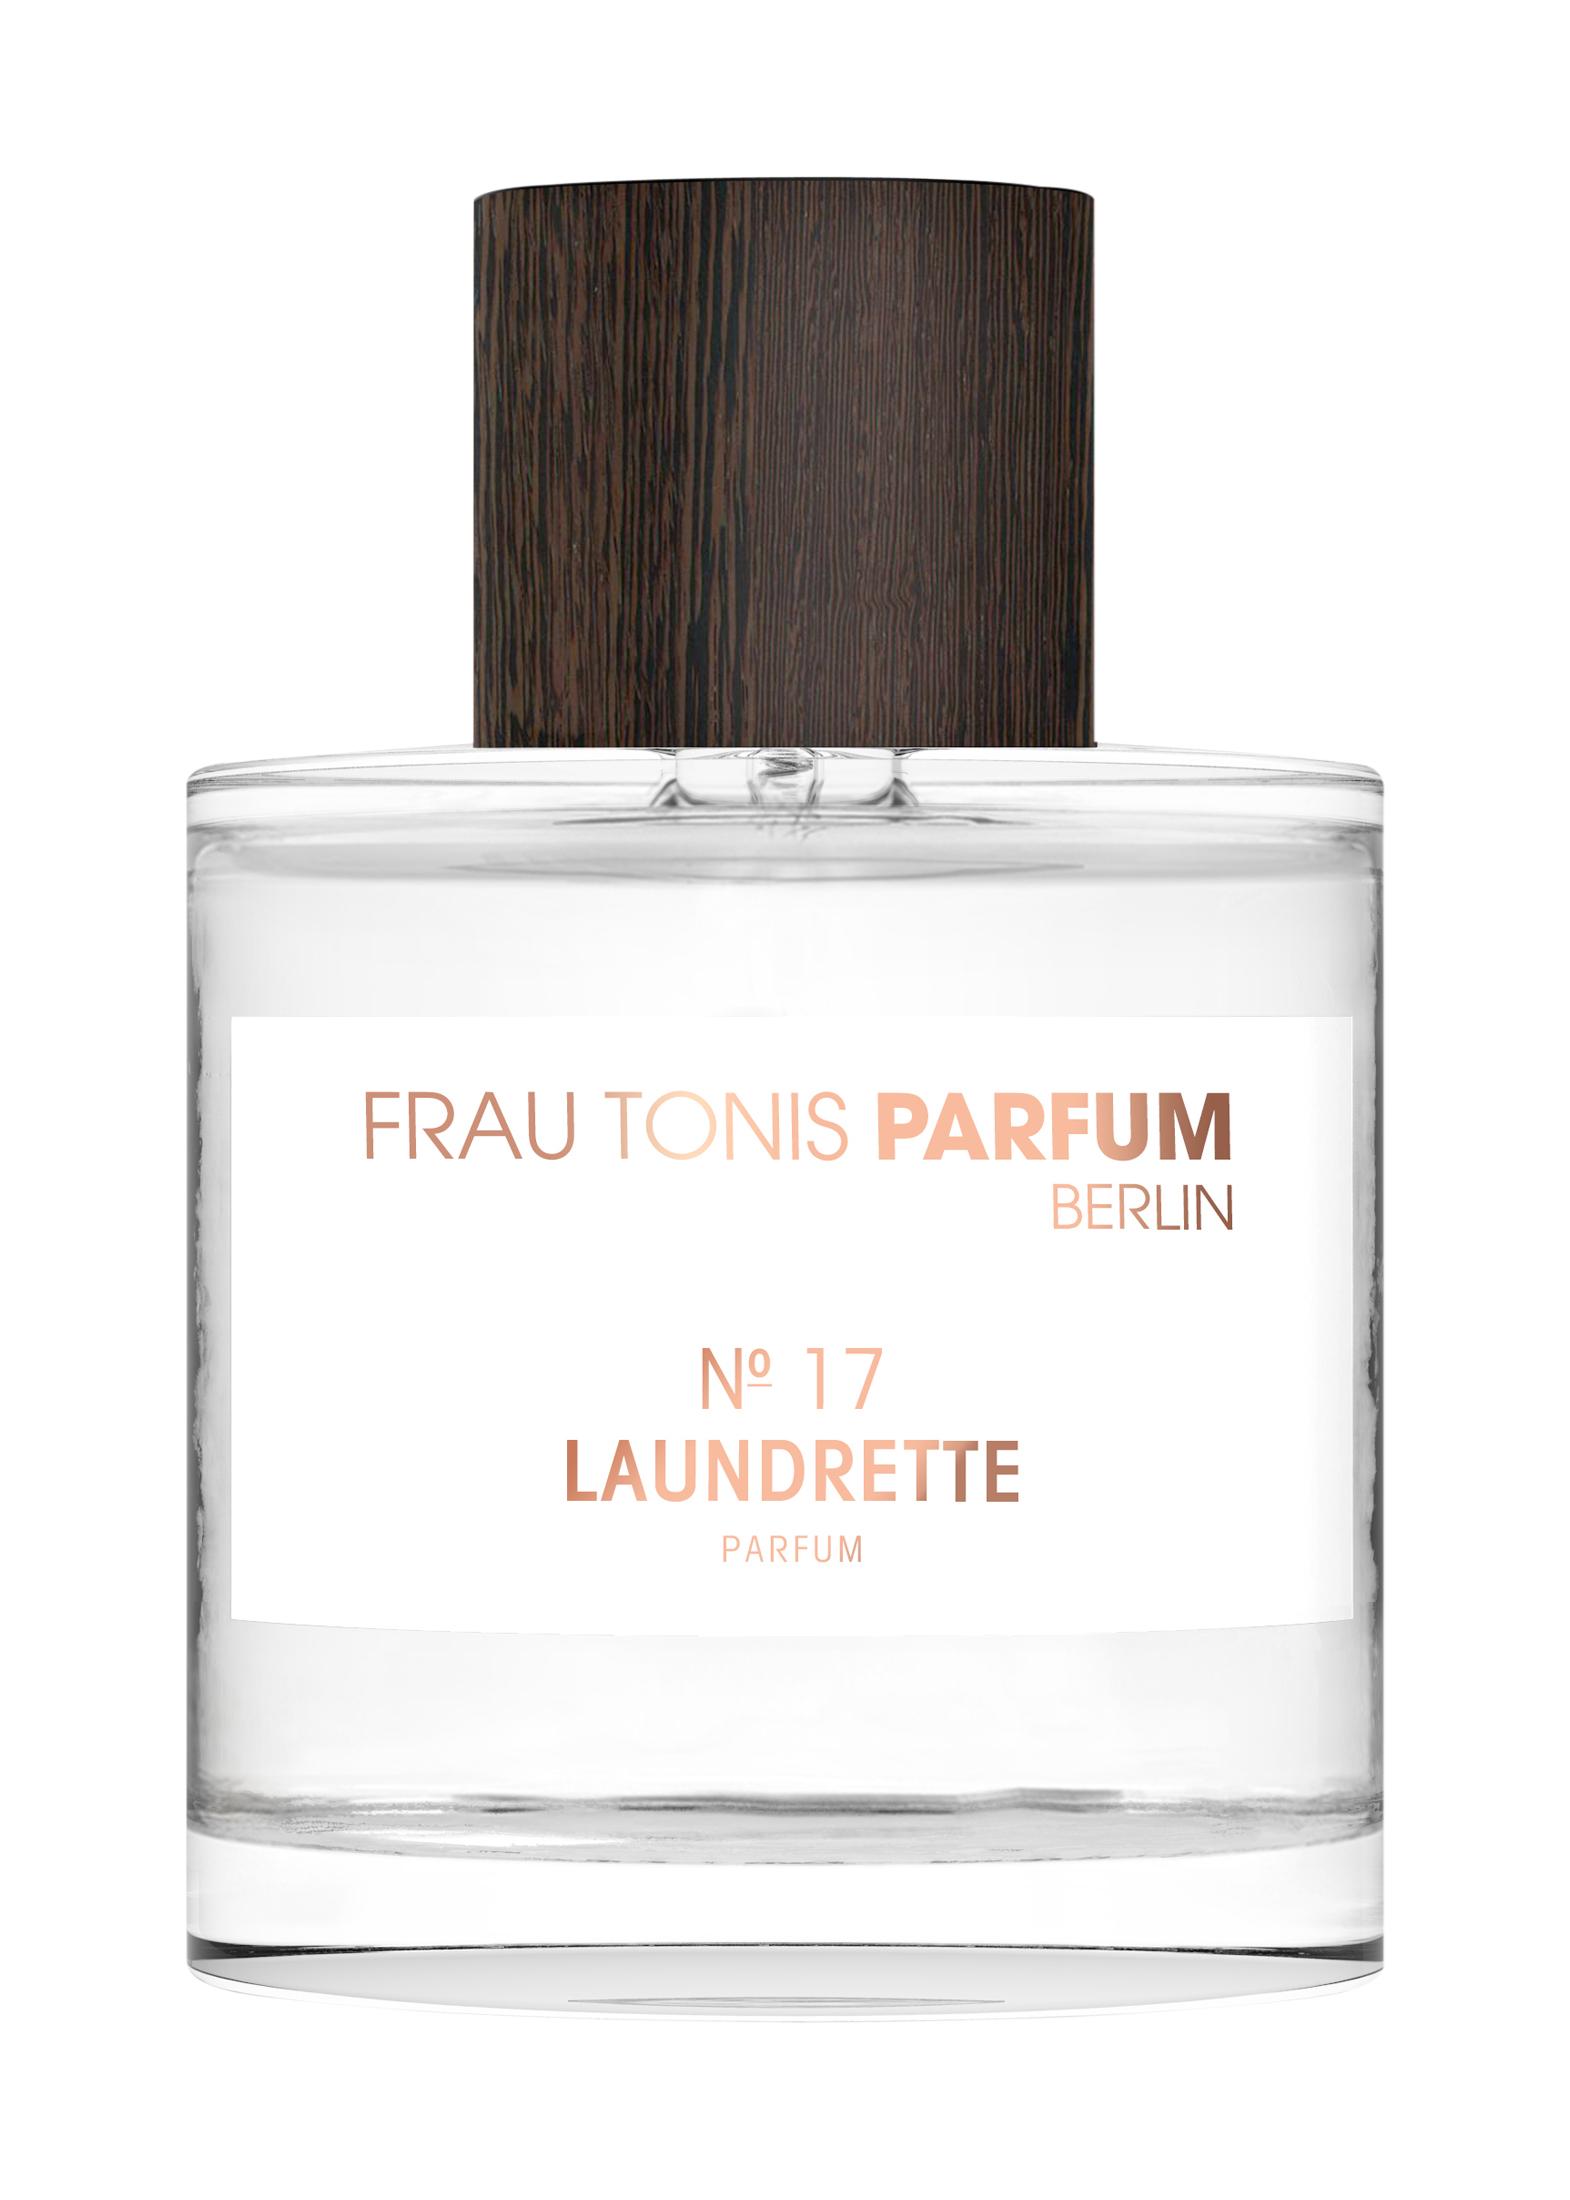 Frau Tonis Parfum 1750P image number 0